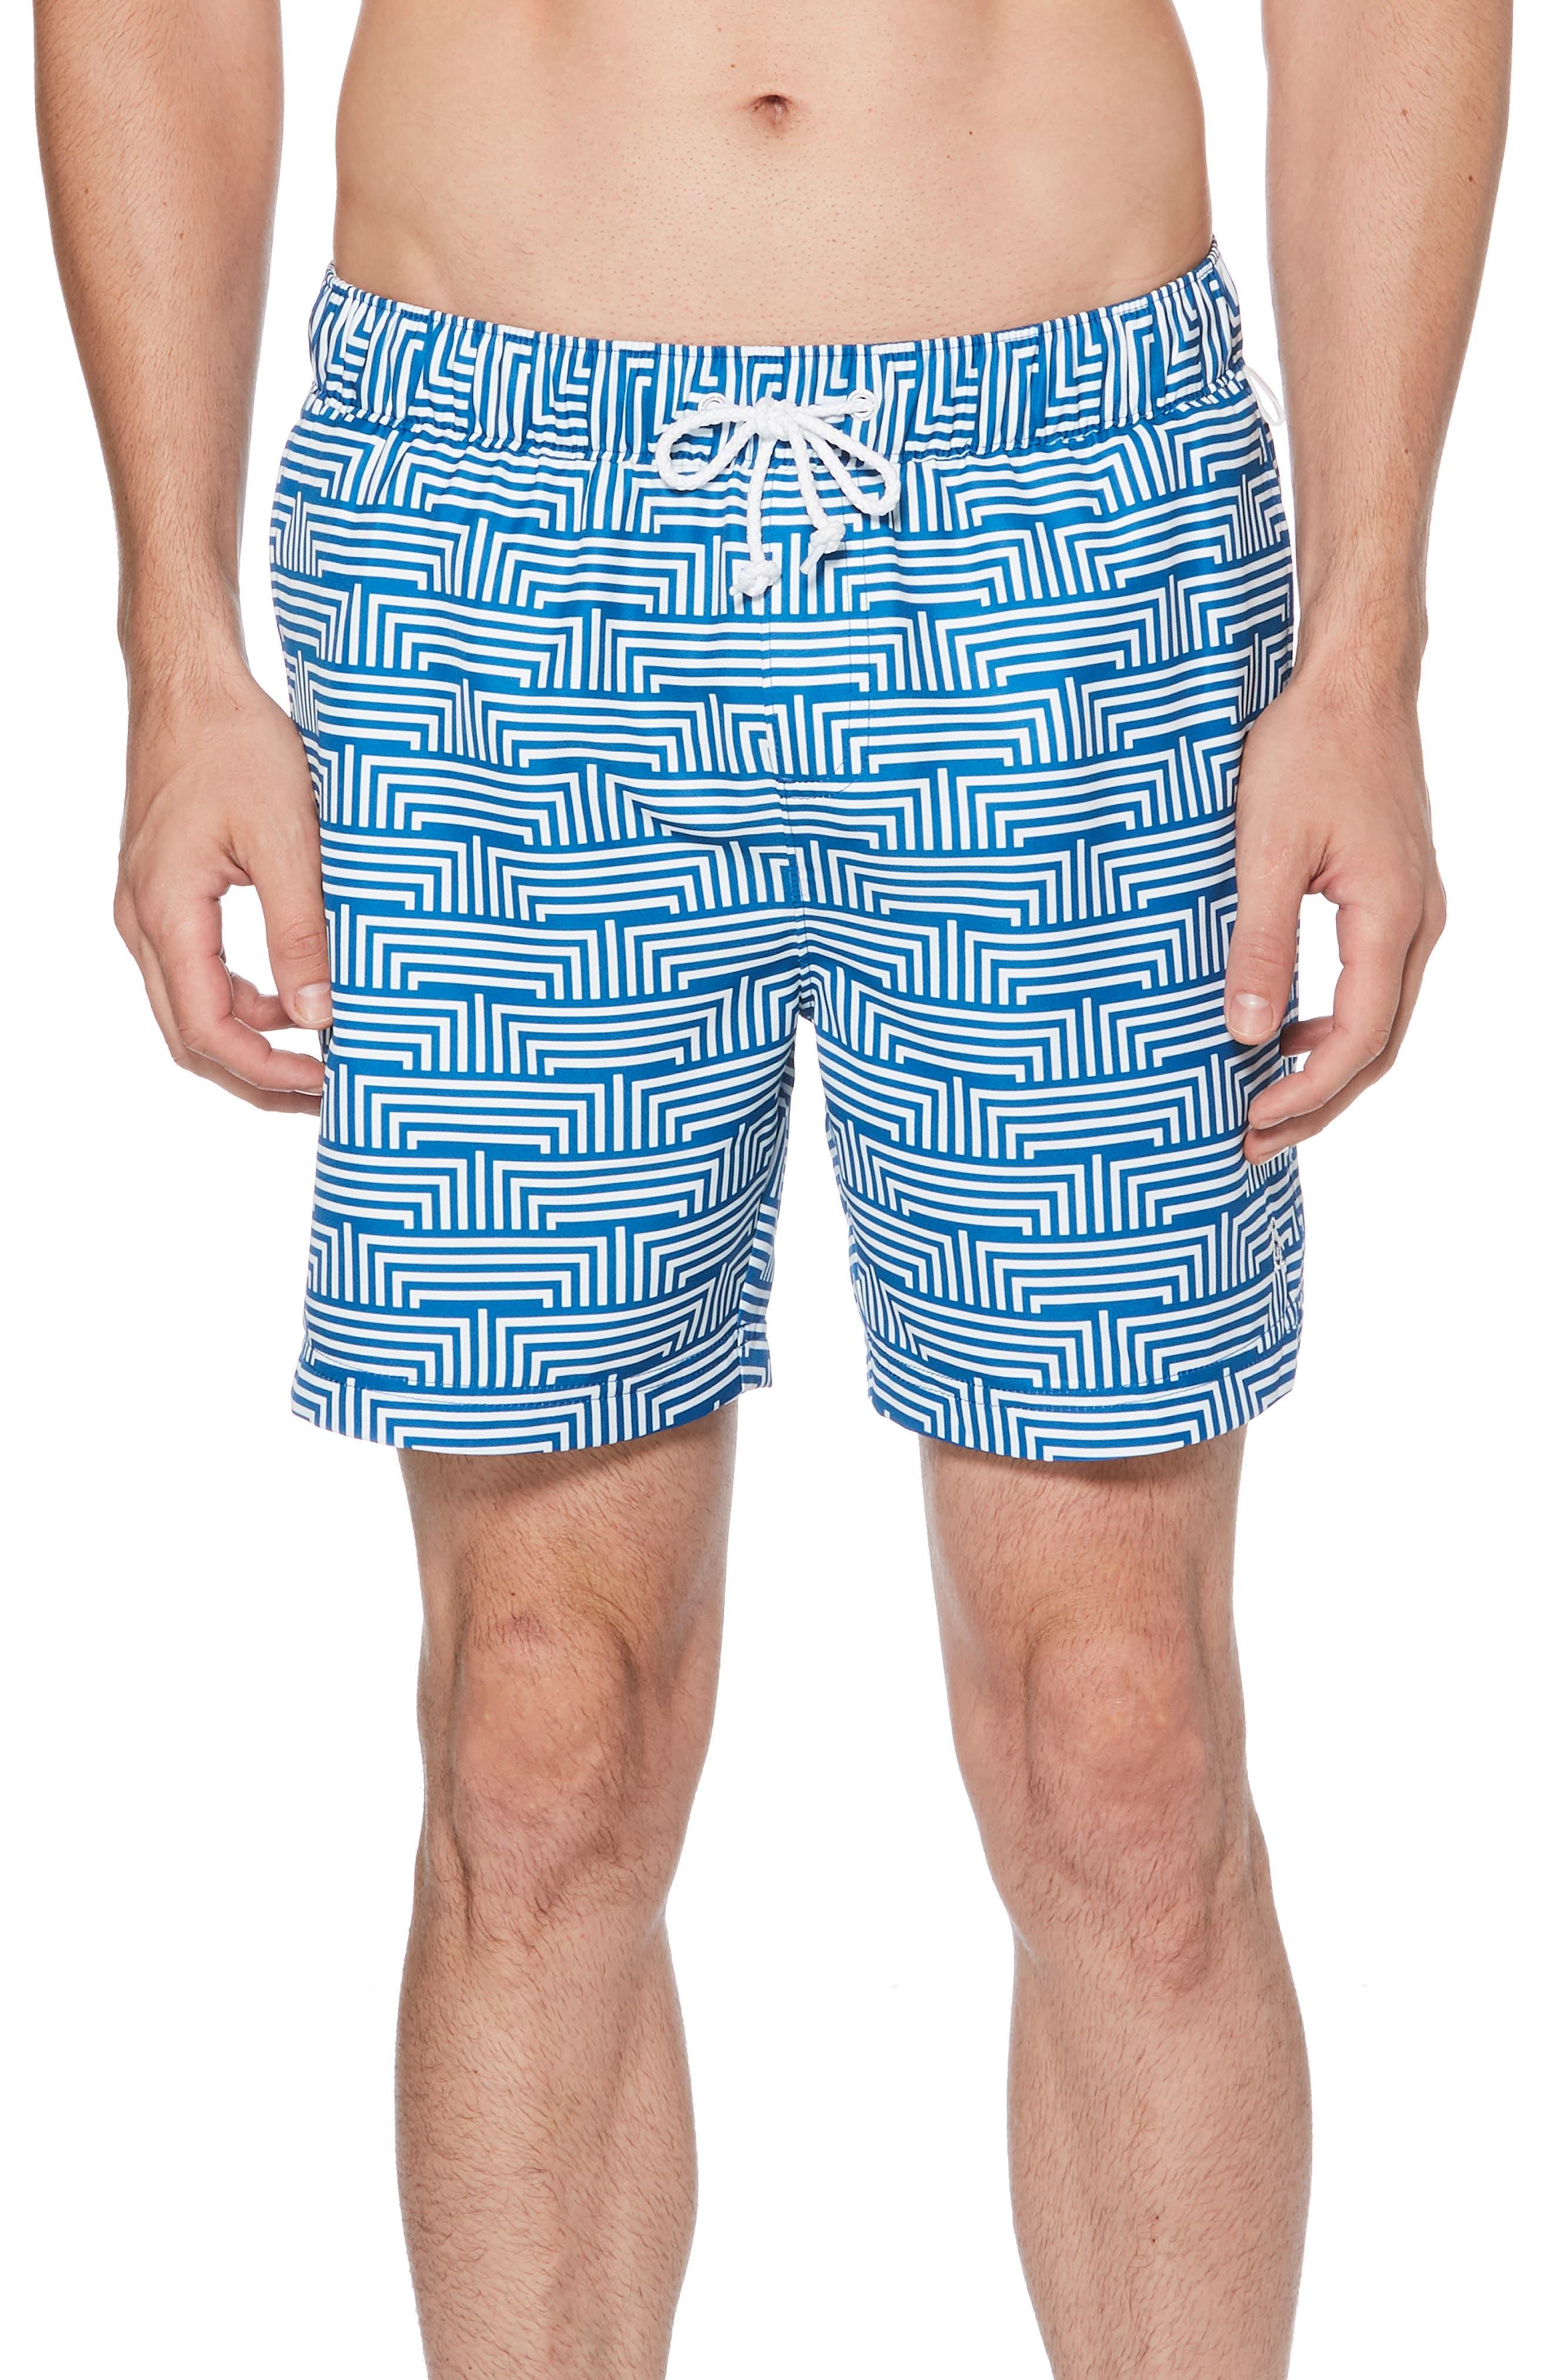 2a333ef8fdfce Original Penguin - Men's Swimwear and Beachwear